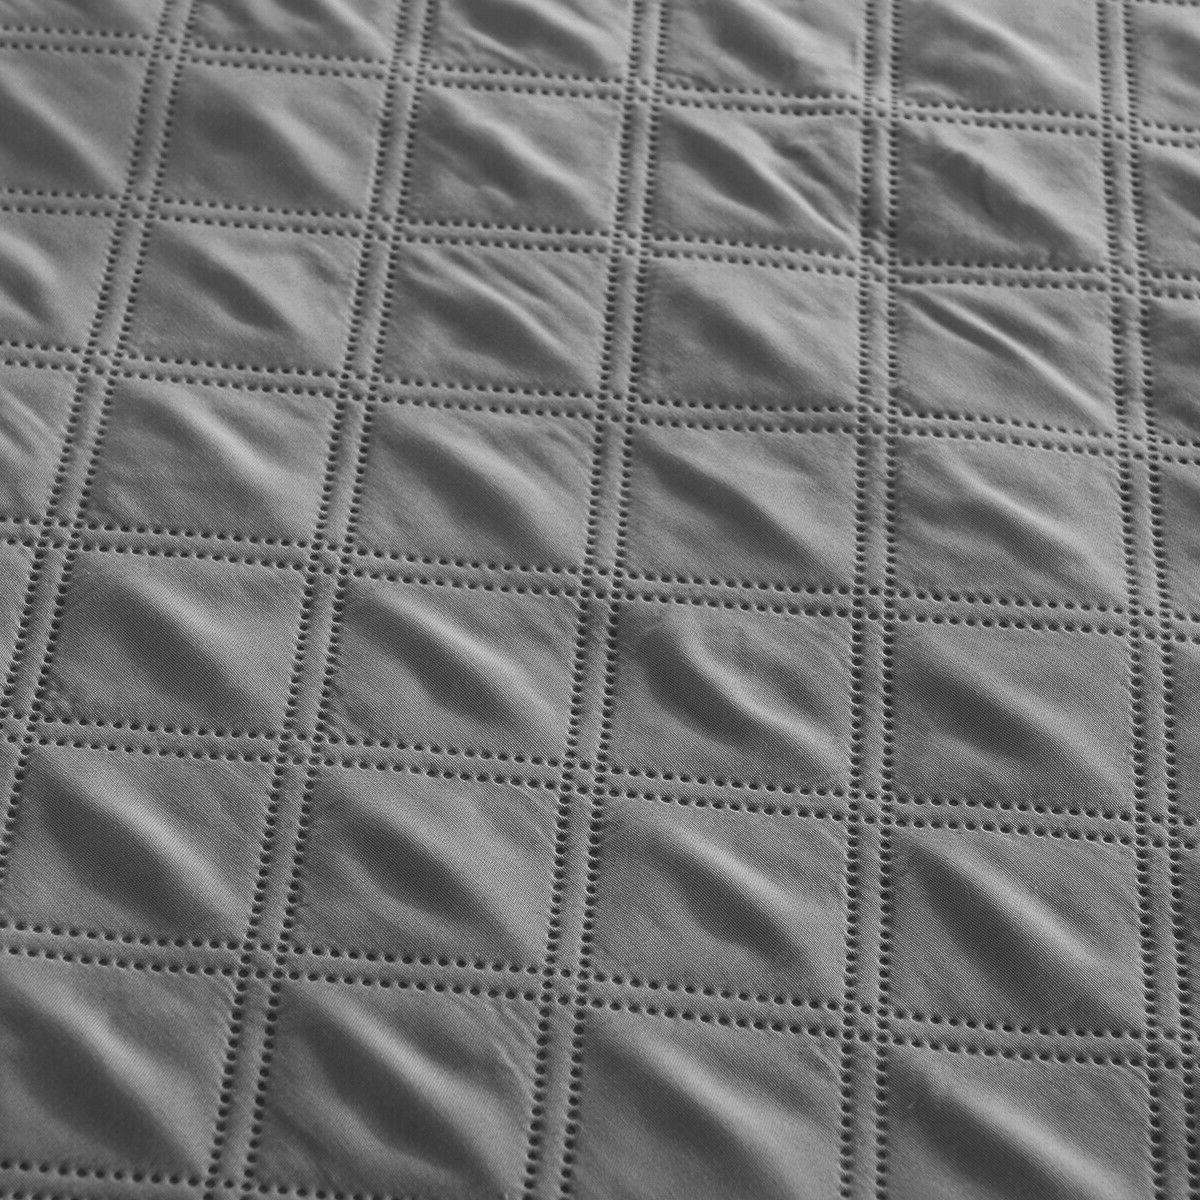 Electric Heated Blanket Heating Mattress